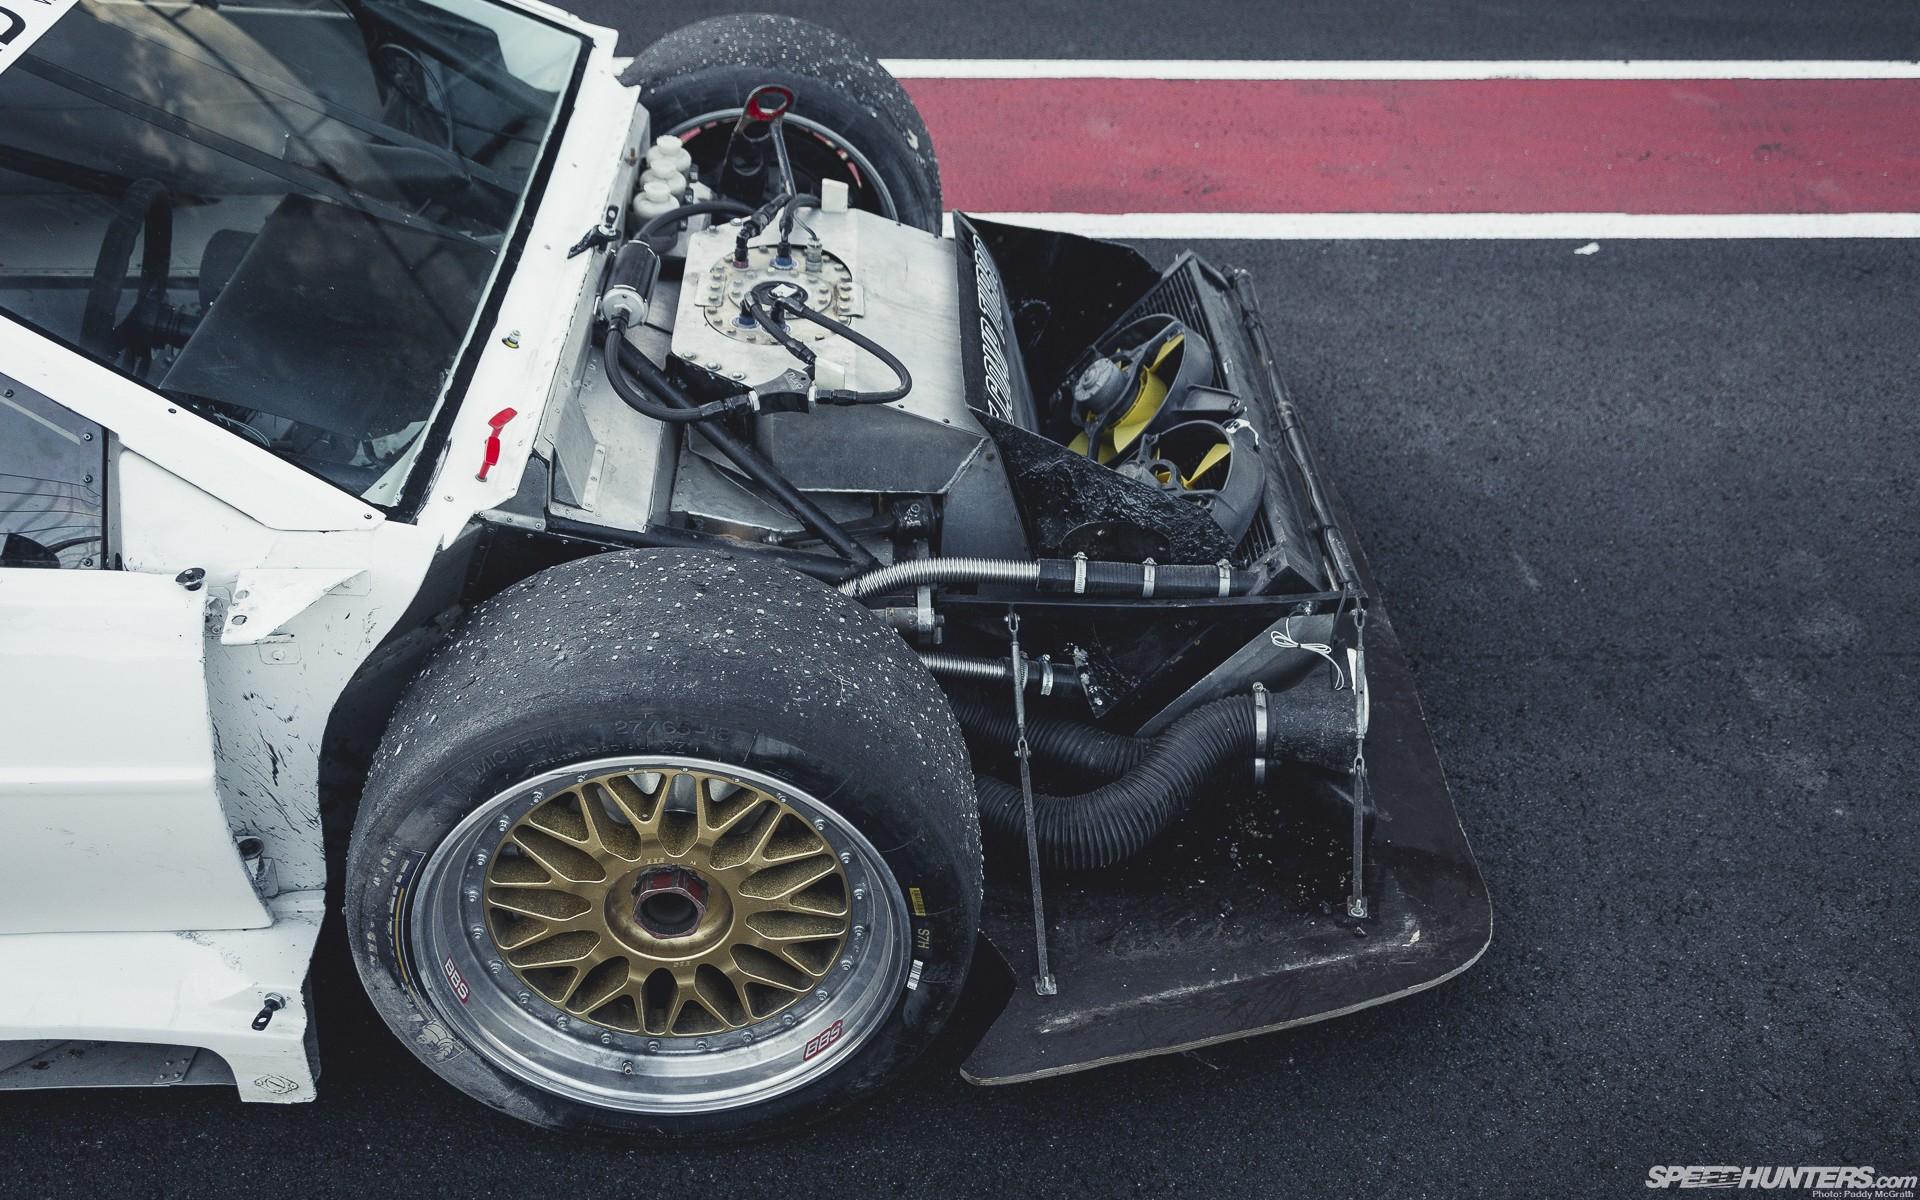 Cars Rusted Tuning Lotus Drift Speedhunters Jdm Wallpaper 1920x1200 182945 Wallpaperup